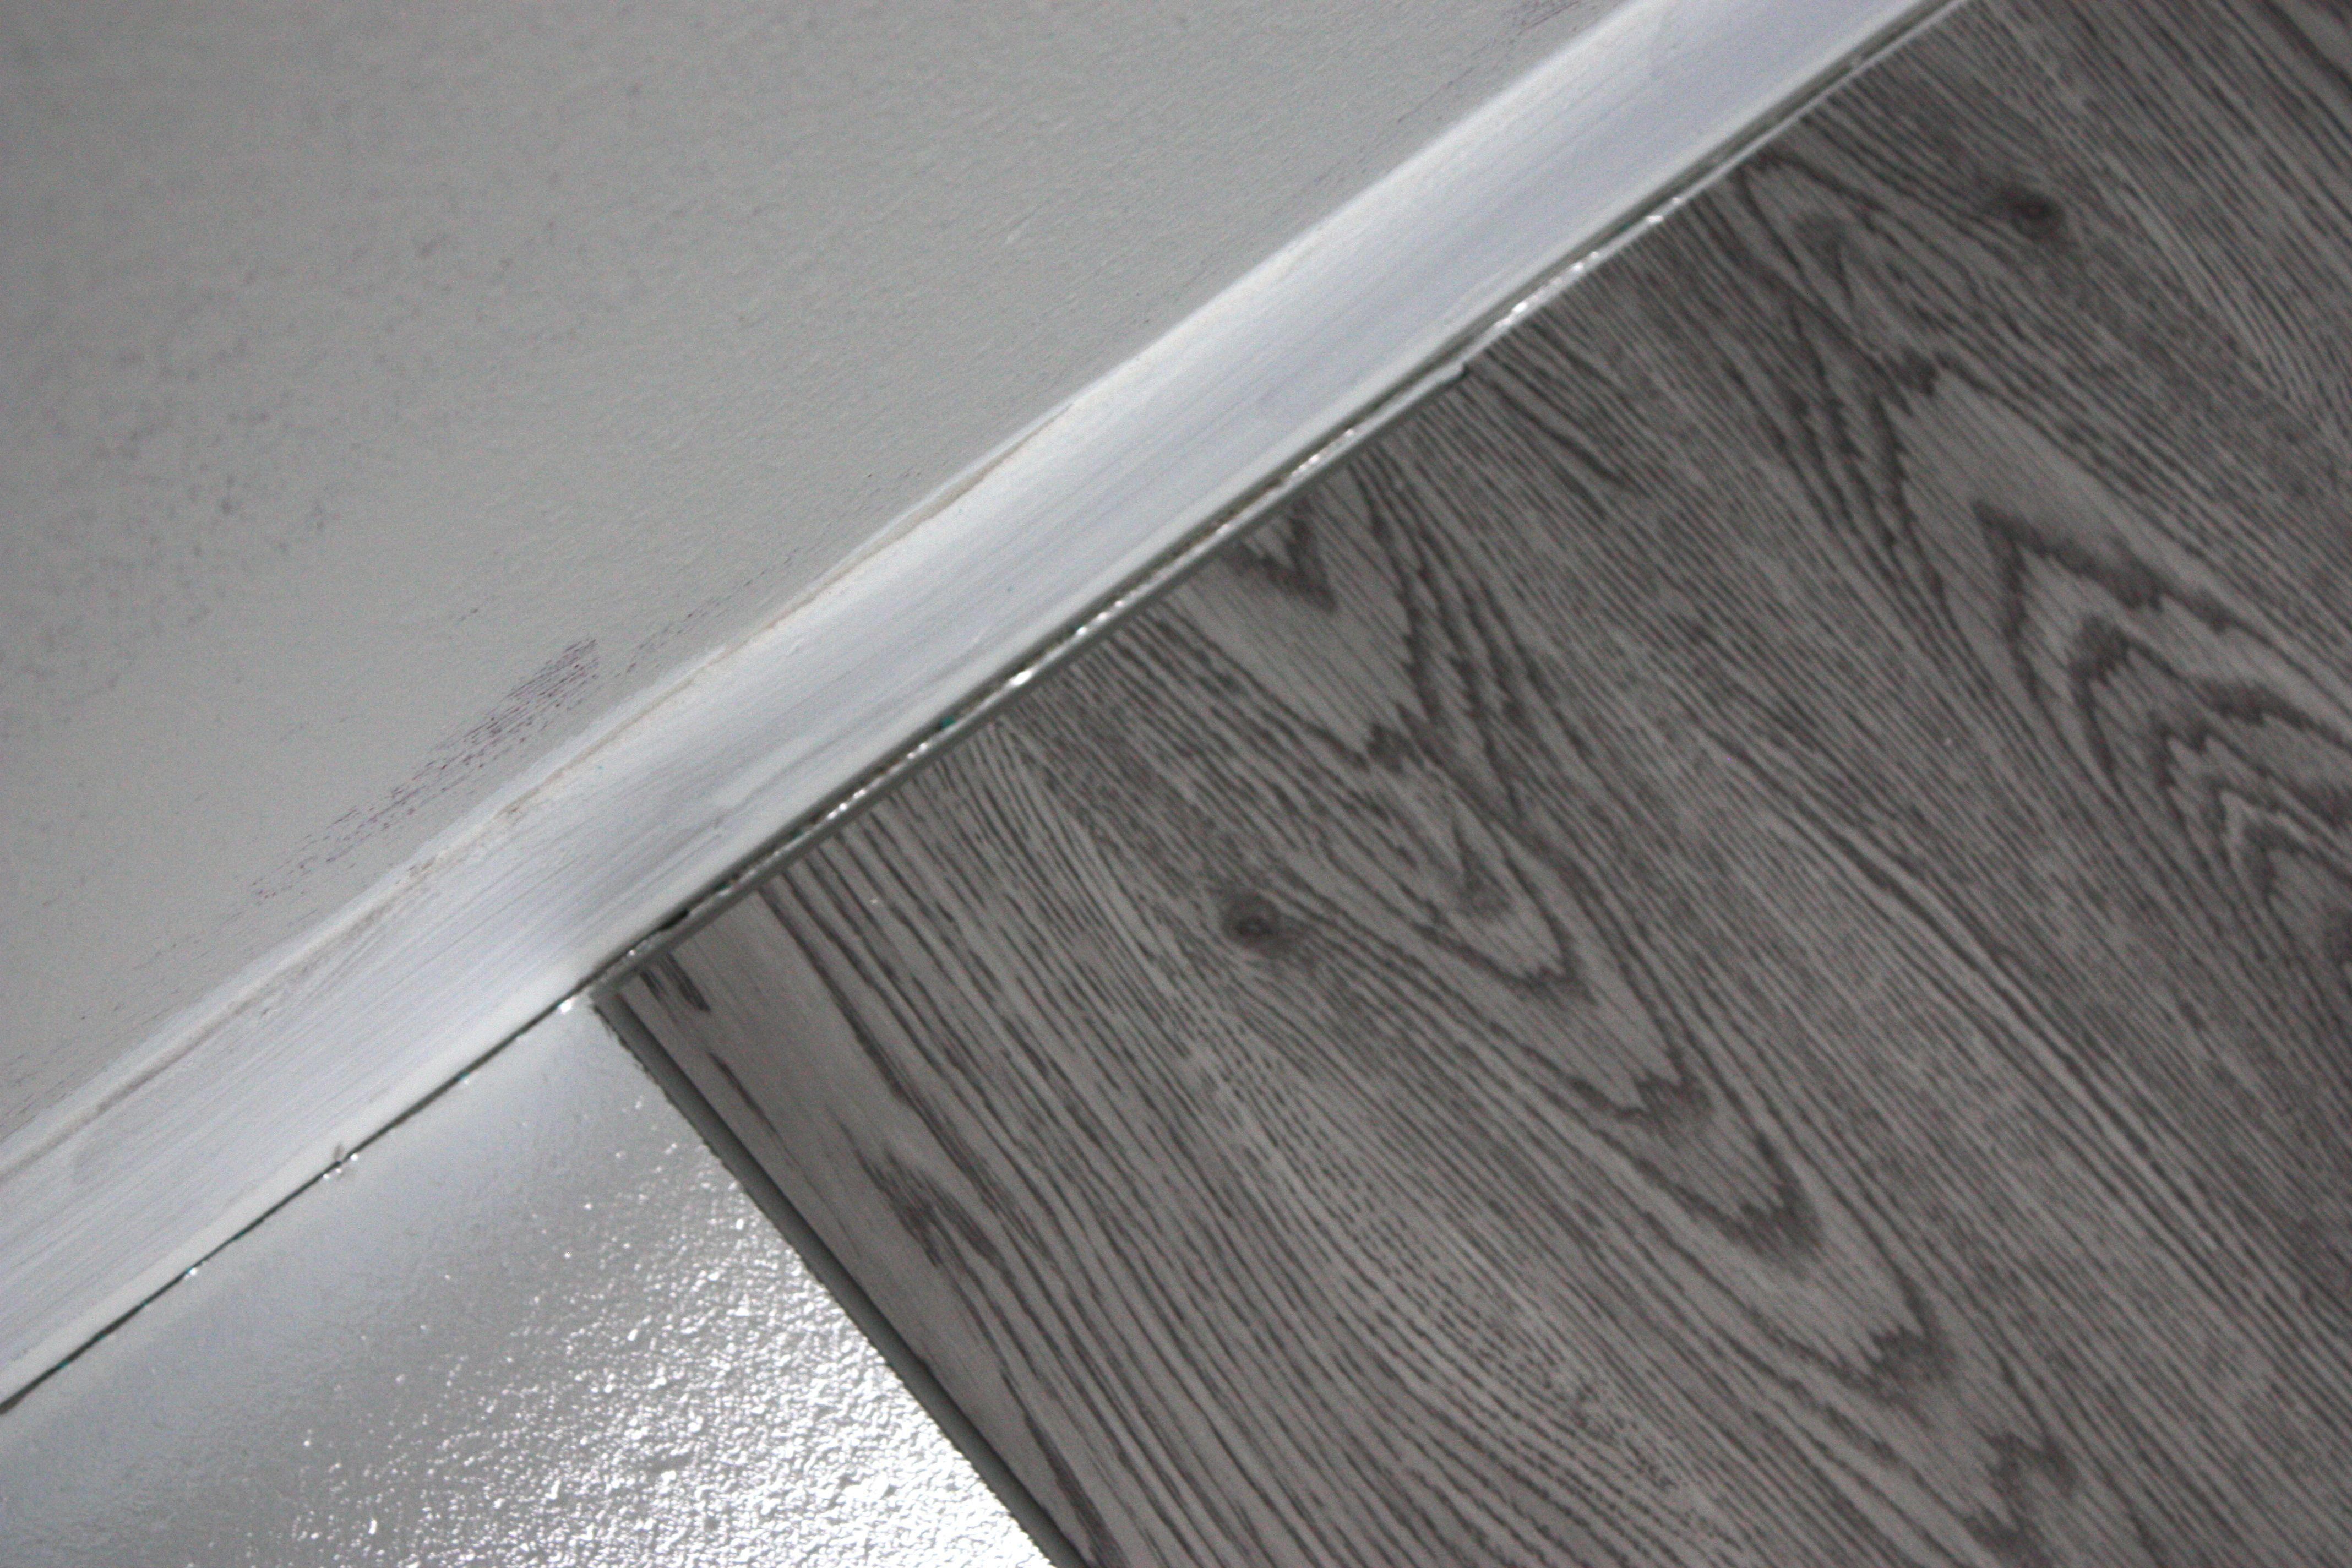 glamorous wood grain tile floor ideas for wood floor source hello pretty new floors office floor